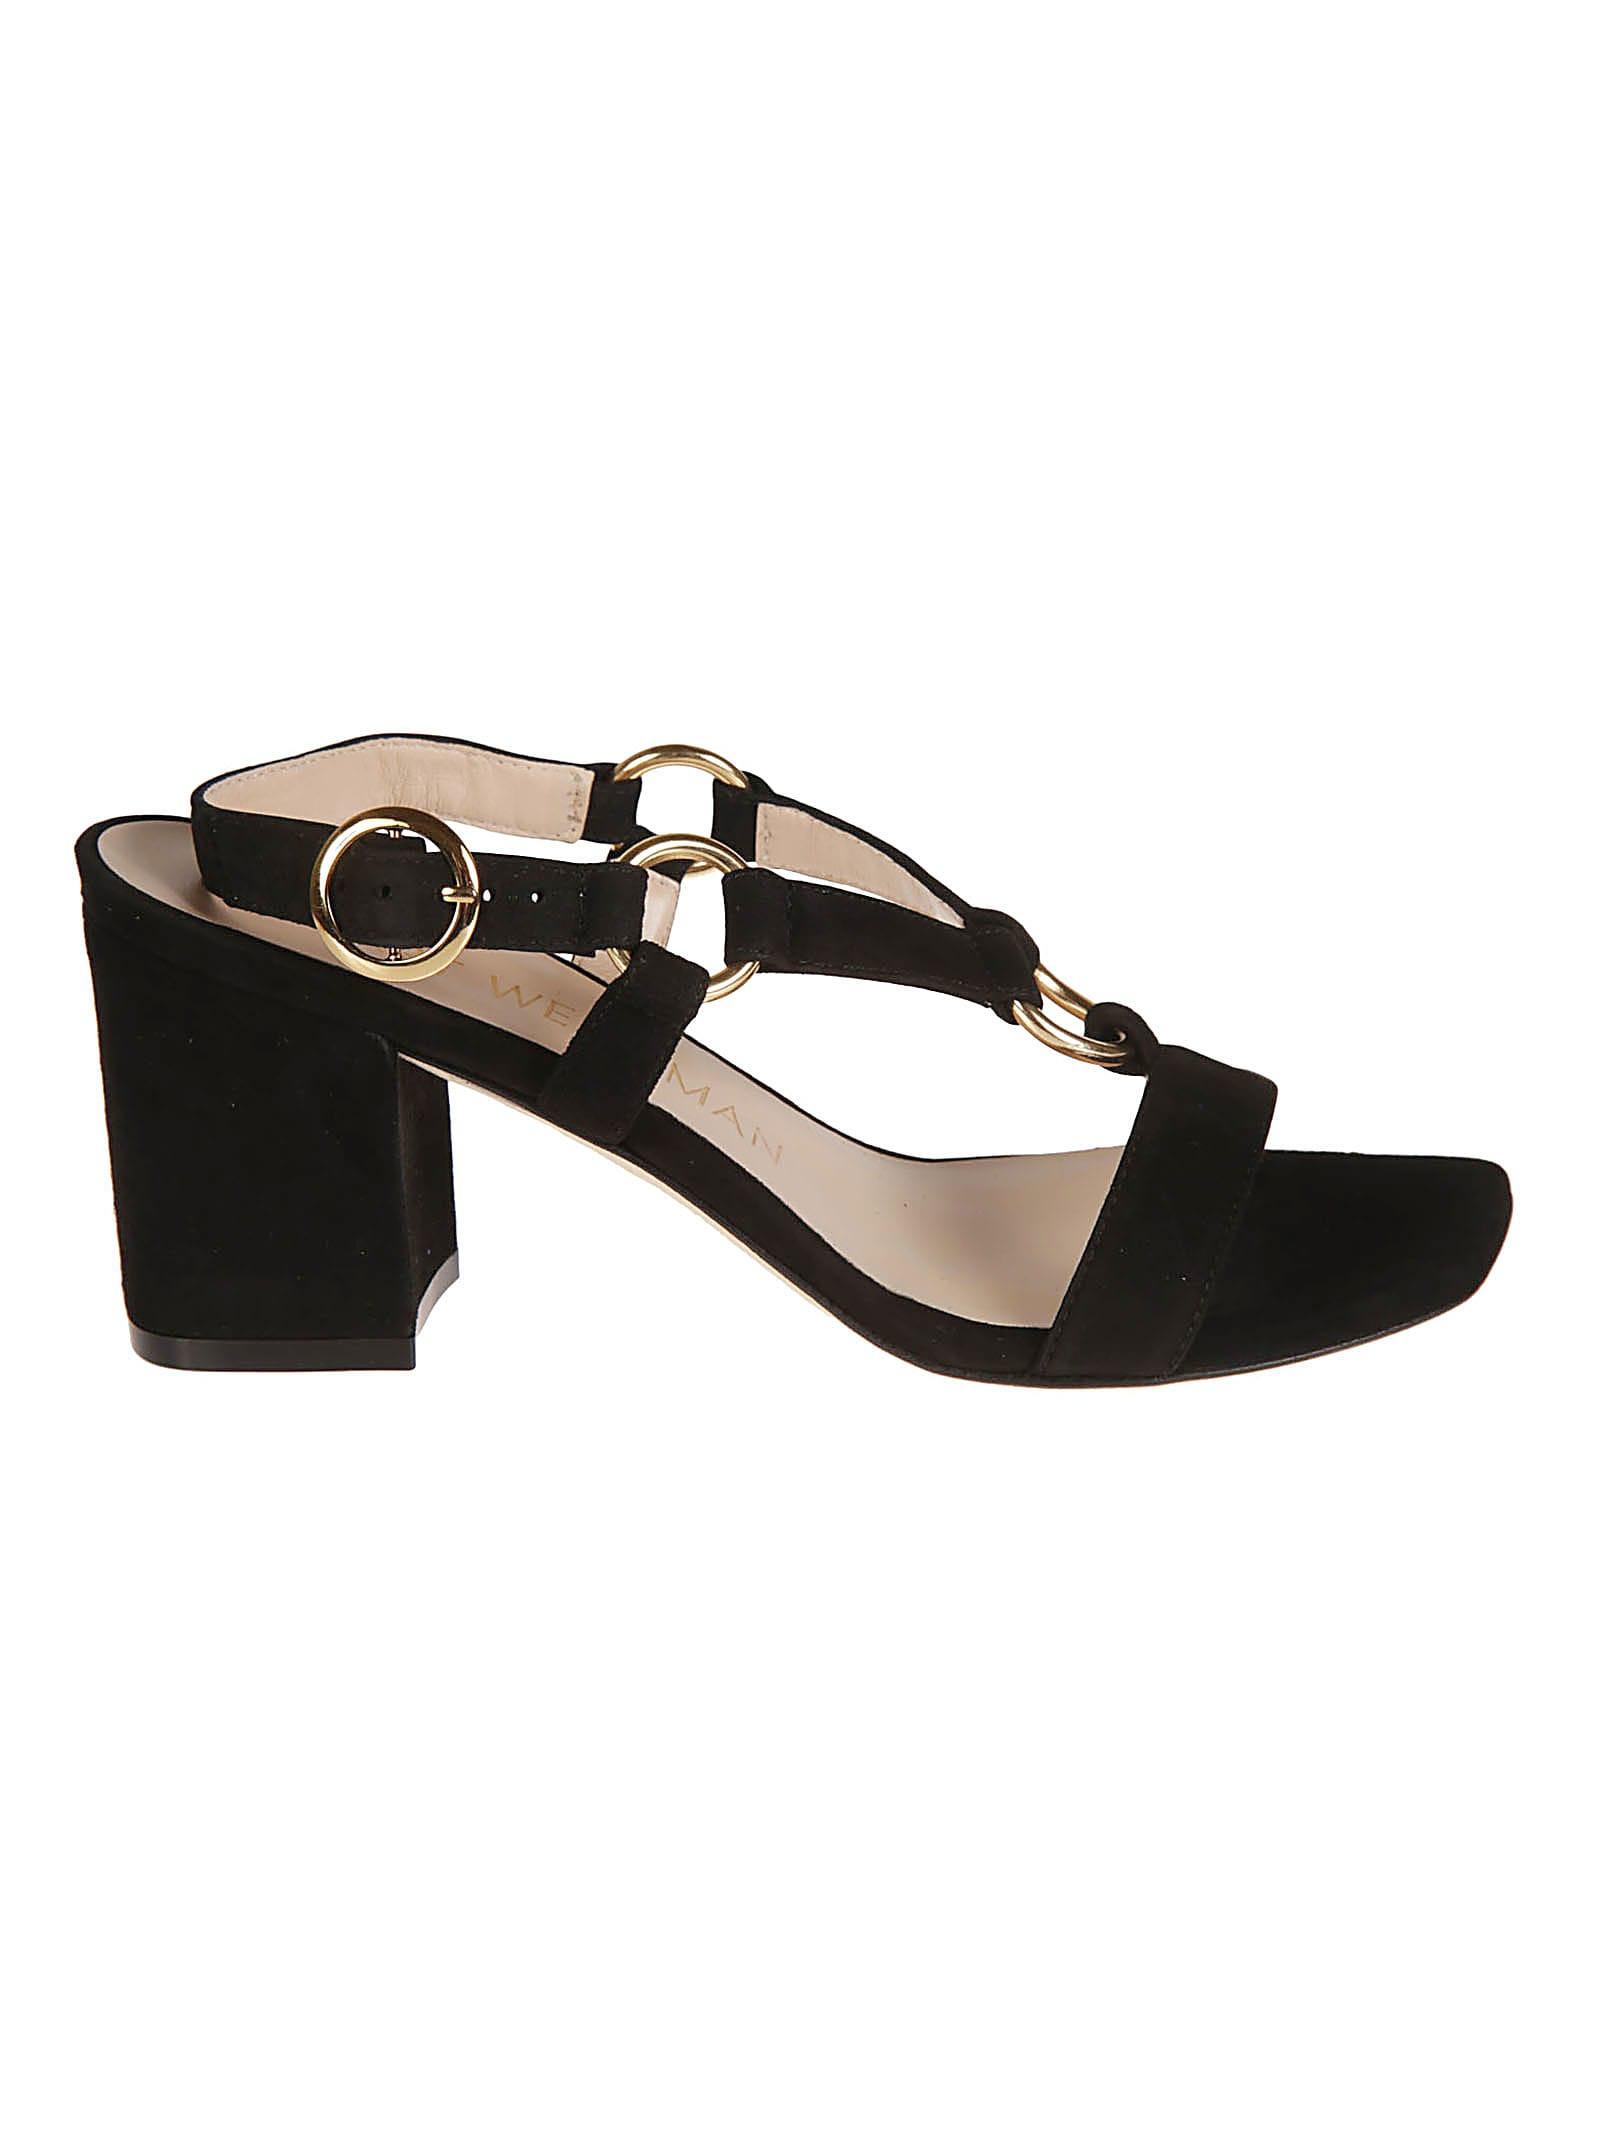 Stuart Weitzman Lalita 75 Blok Sandals